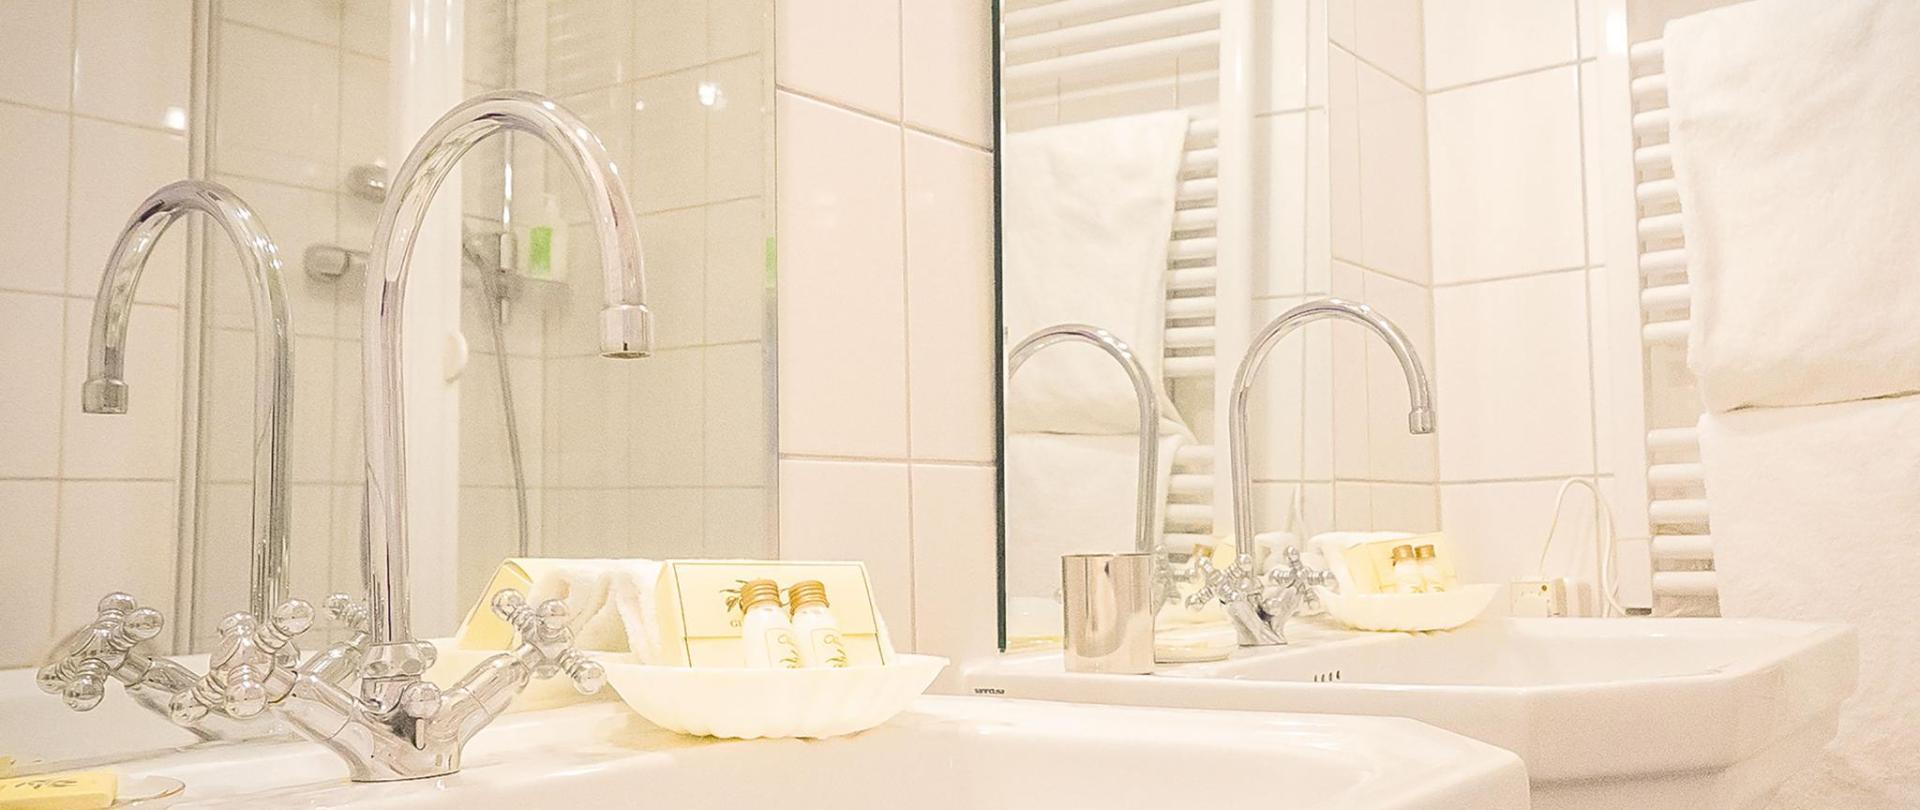 hotel-3koenige-aachen-zimmer_12-carlous_magnus_07.jpg